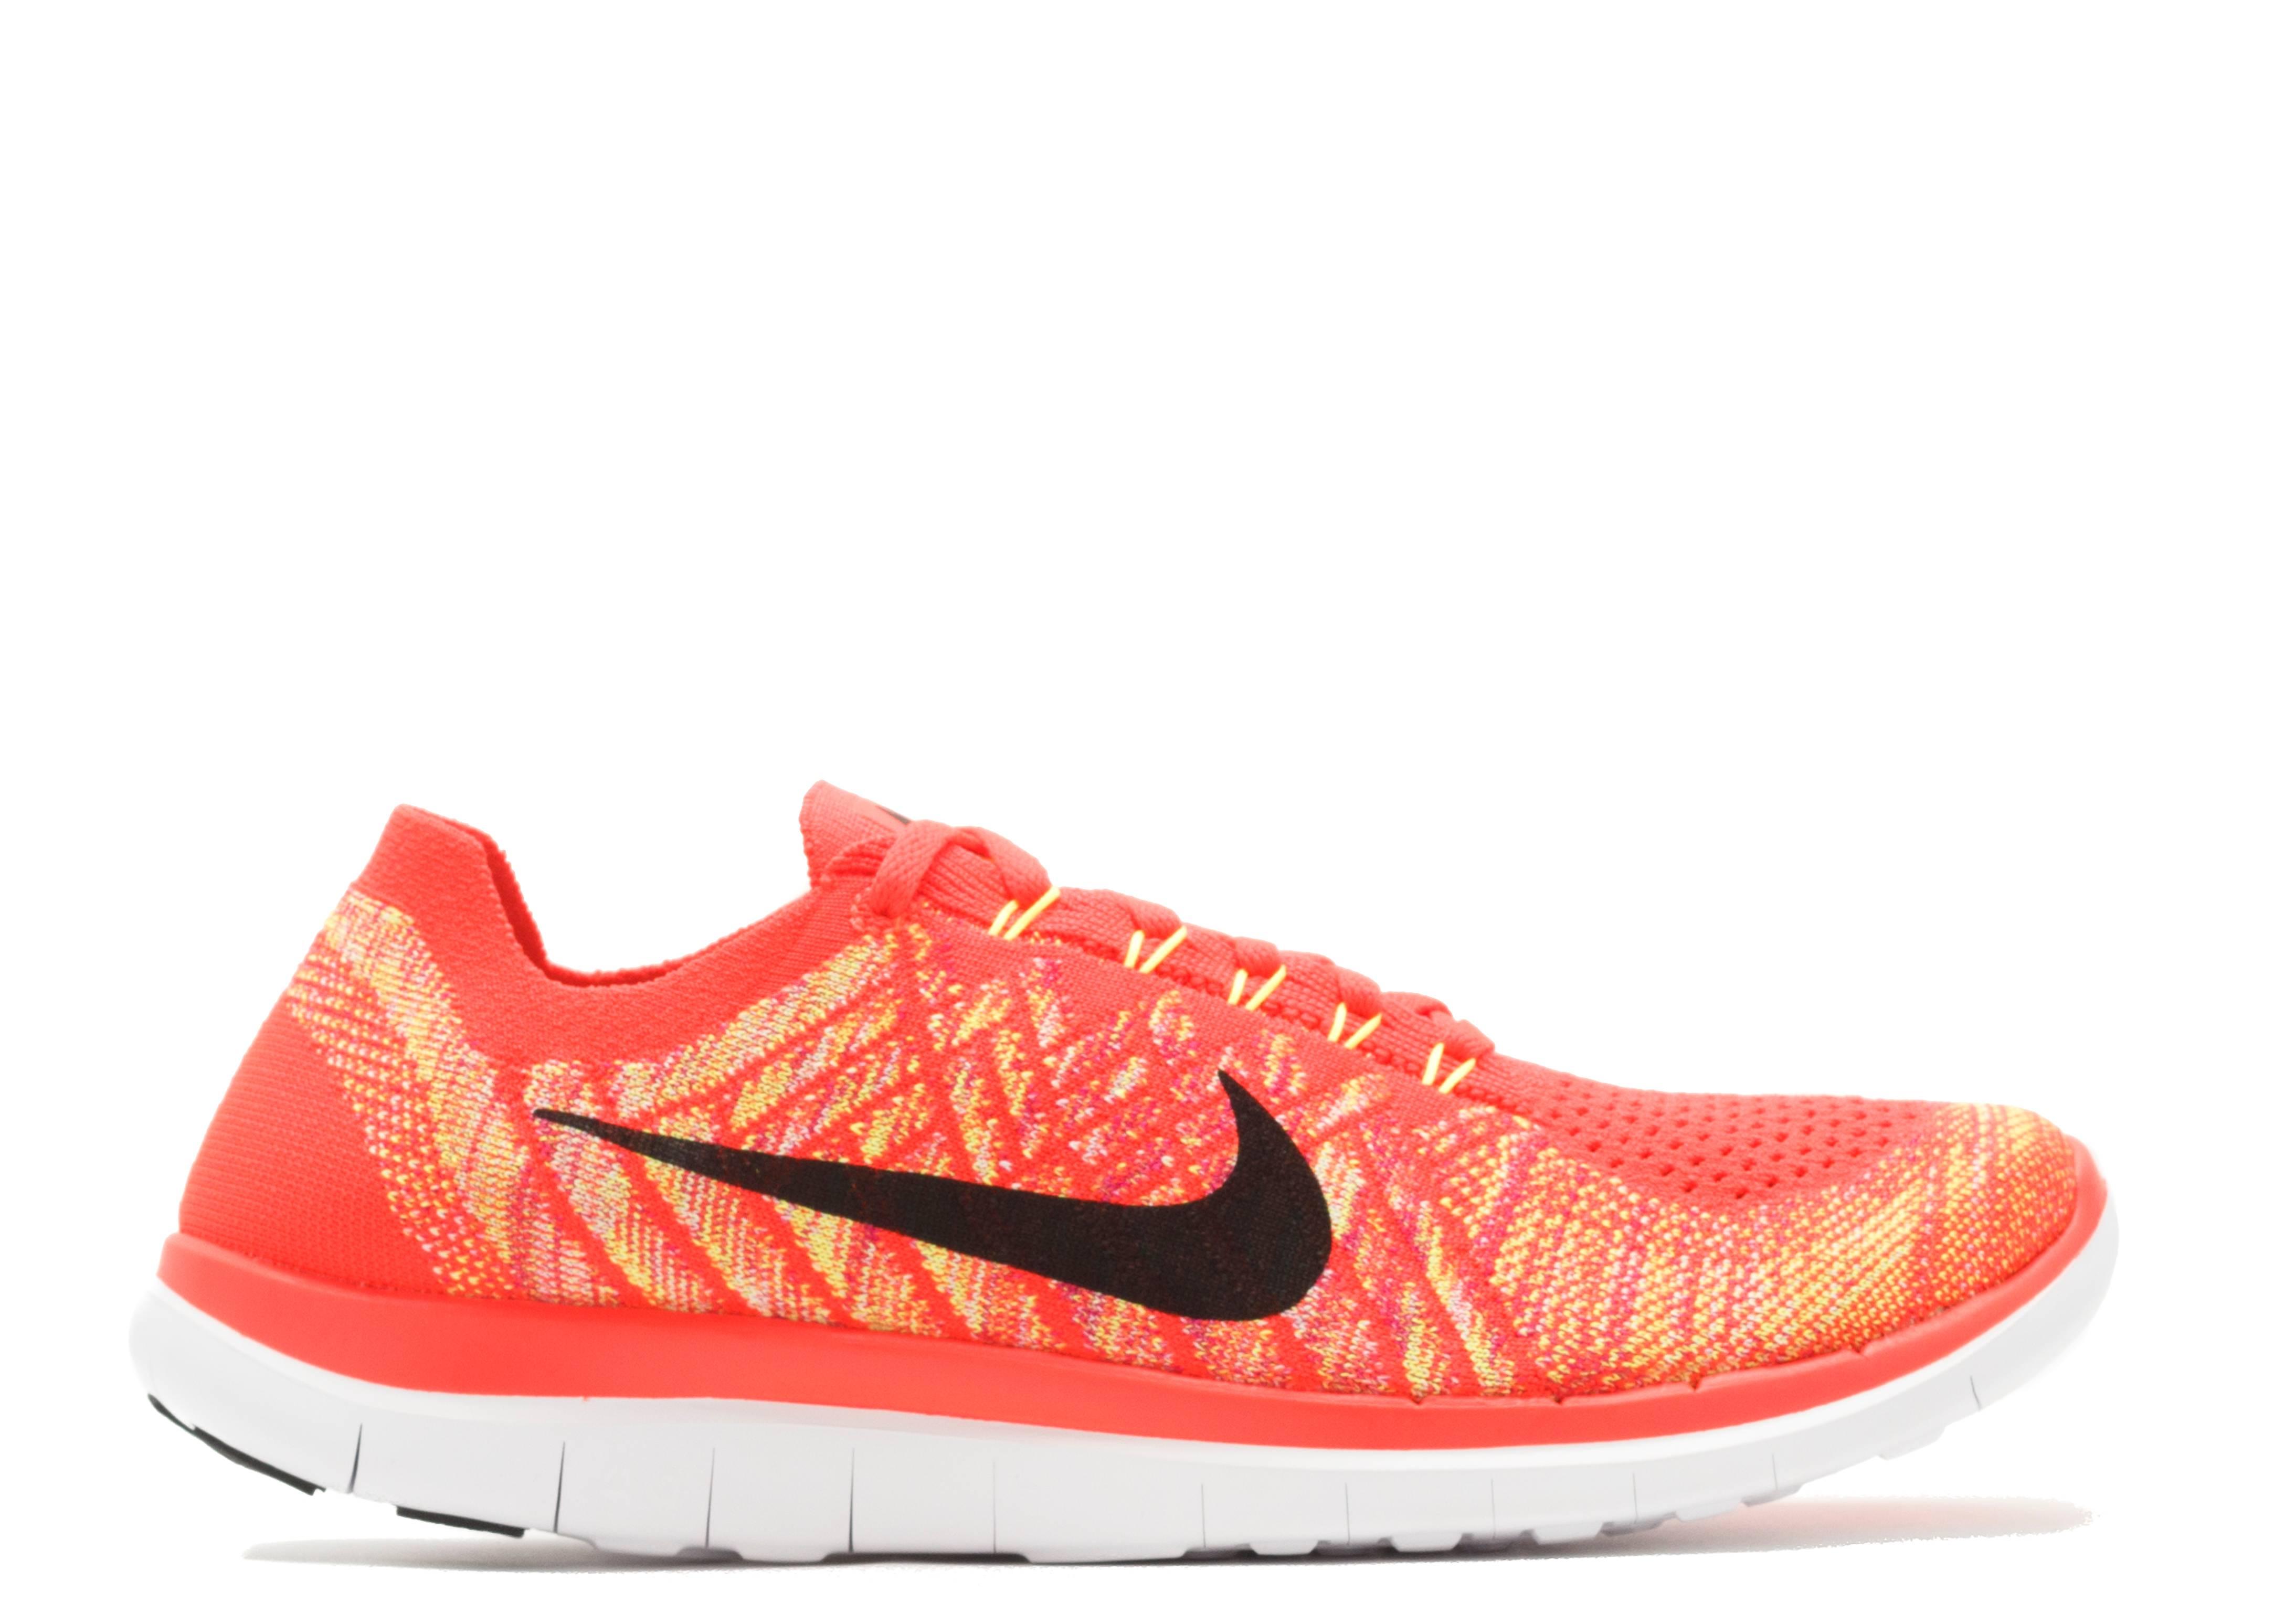 f7895ba3beefe Free 4.0 Flyknit - Nike - 717075 600 - bright crimson black-ht lv-vlt